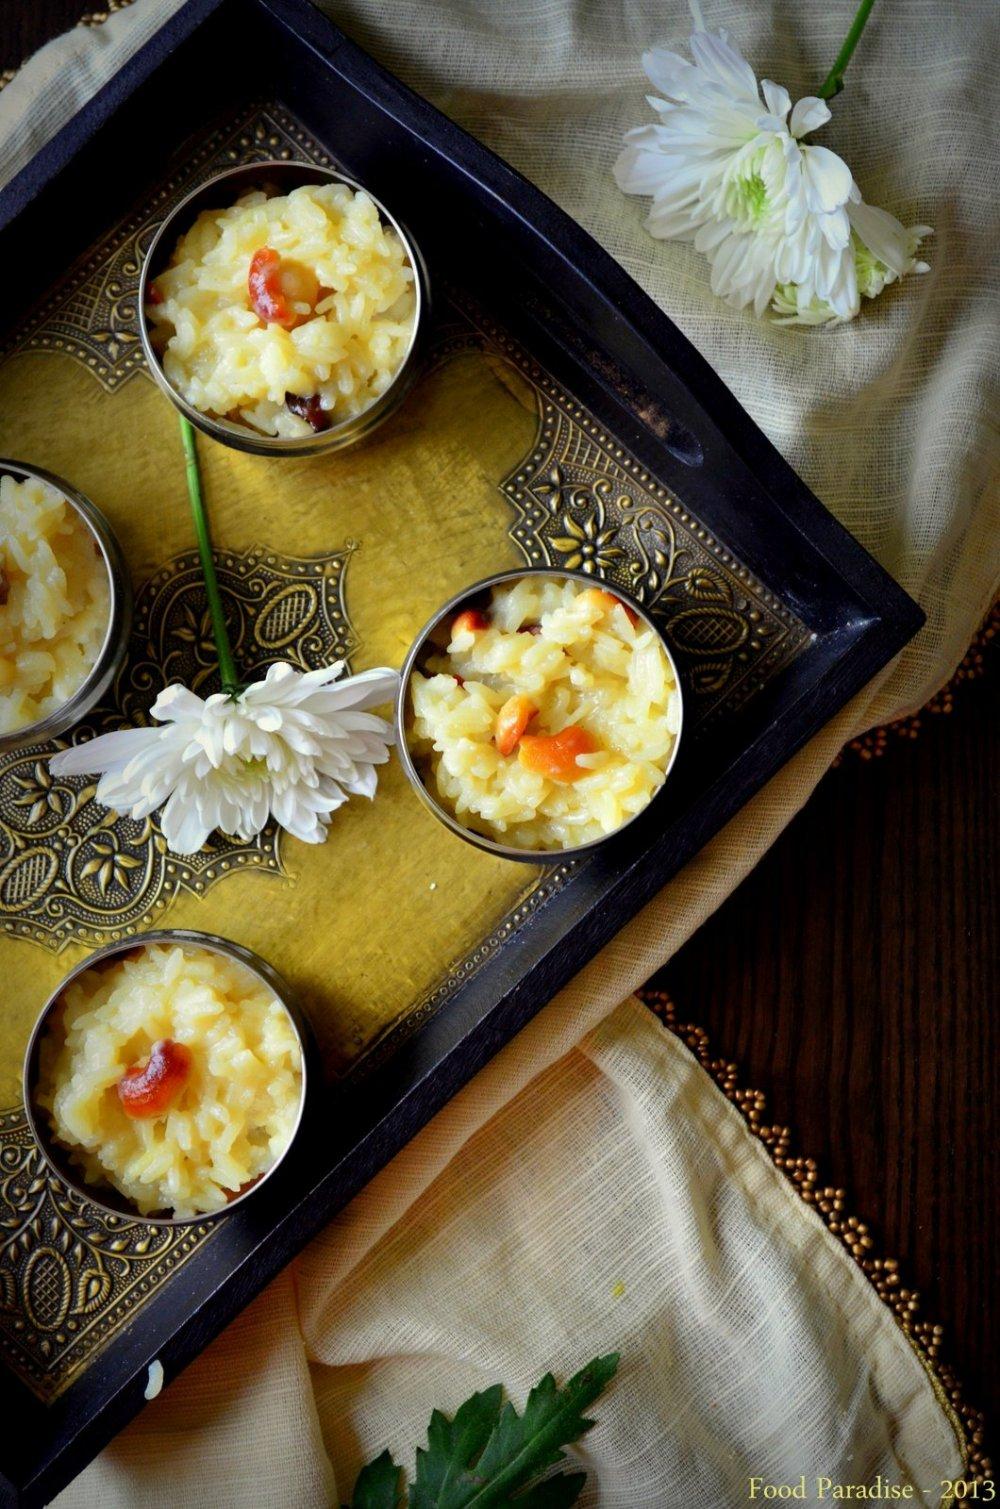 Paramannam - Jaggery Rice Pudding